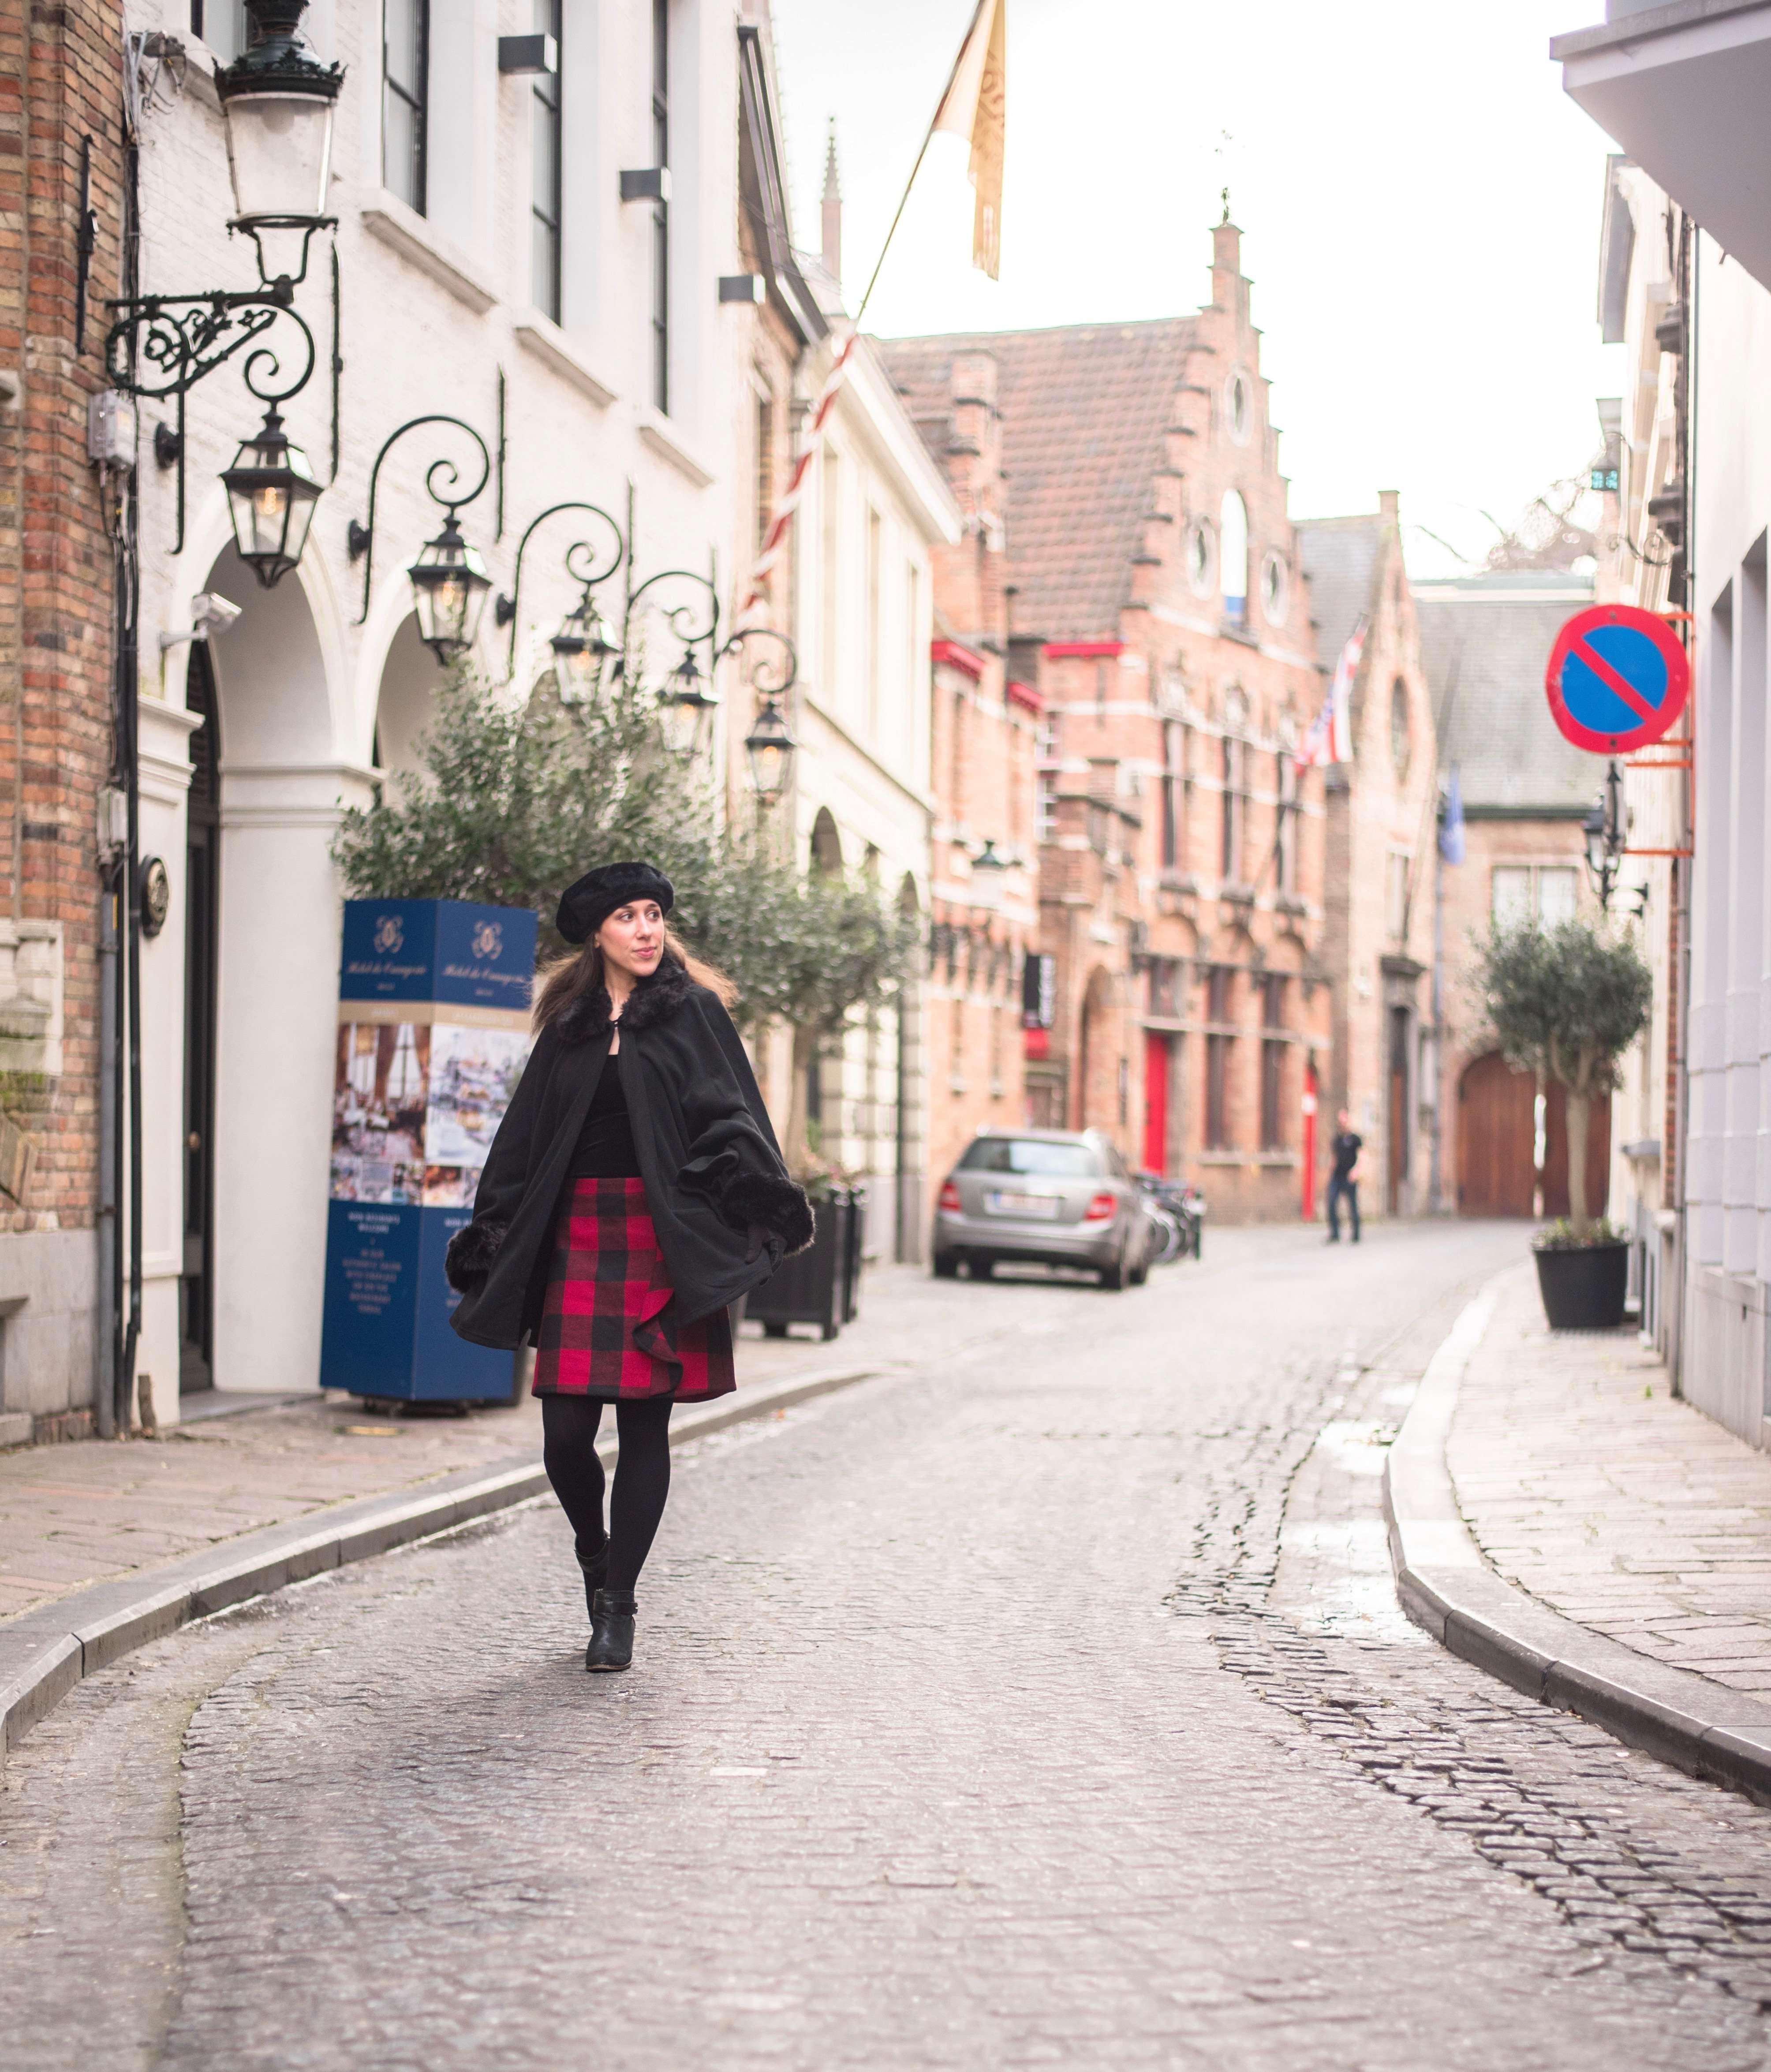 Cobblestone streets of Bruges